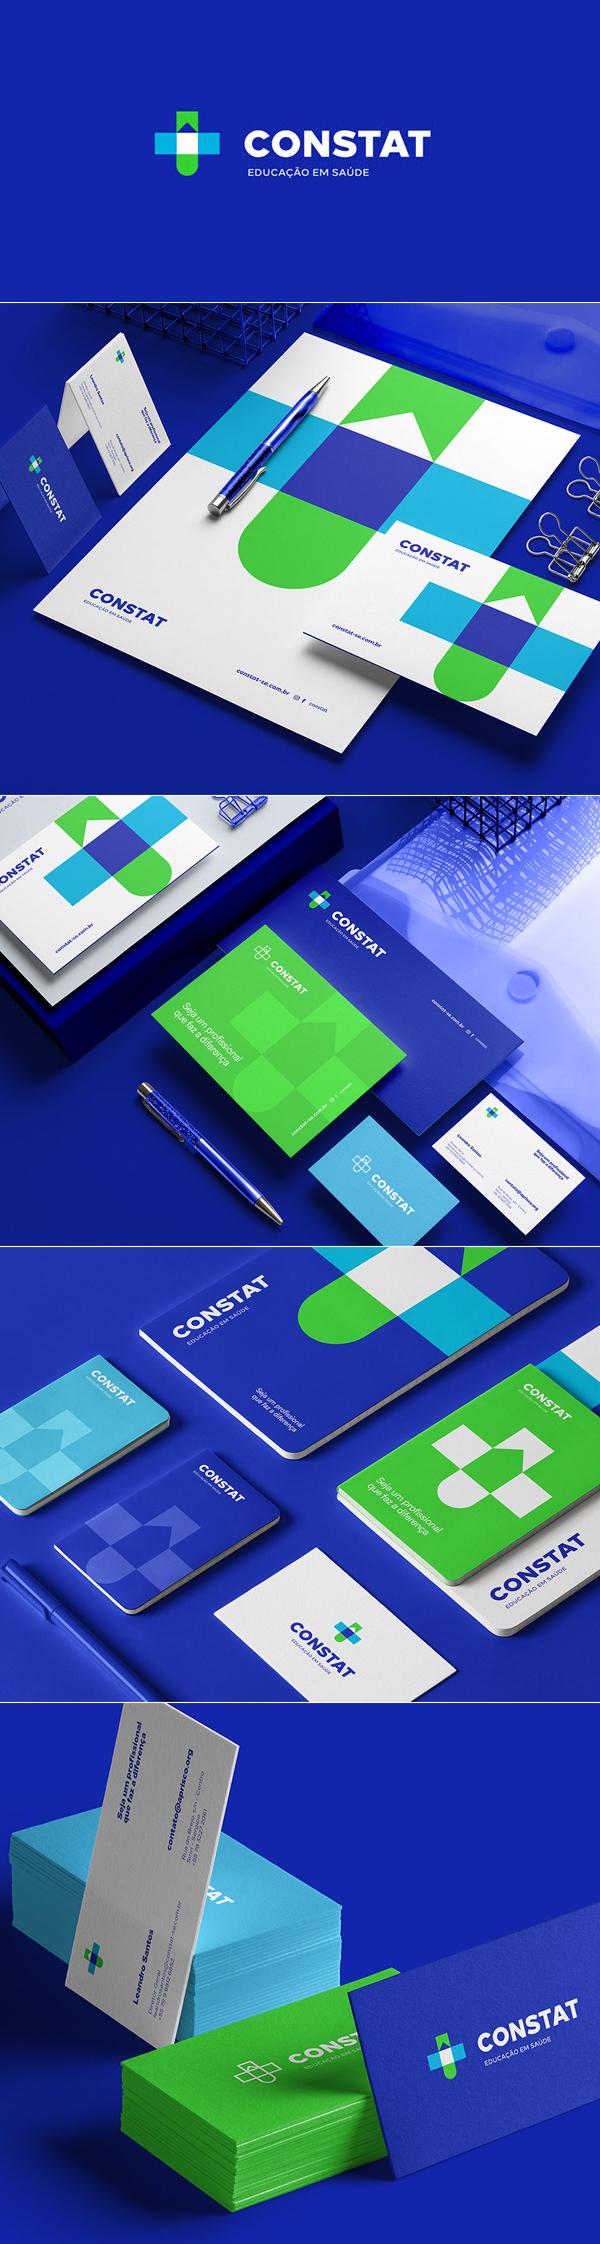 Constat Educaçao Branding by John Dias